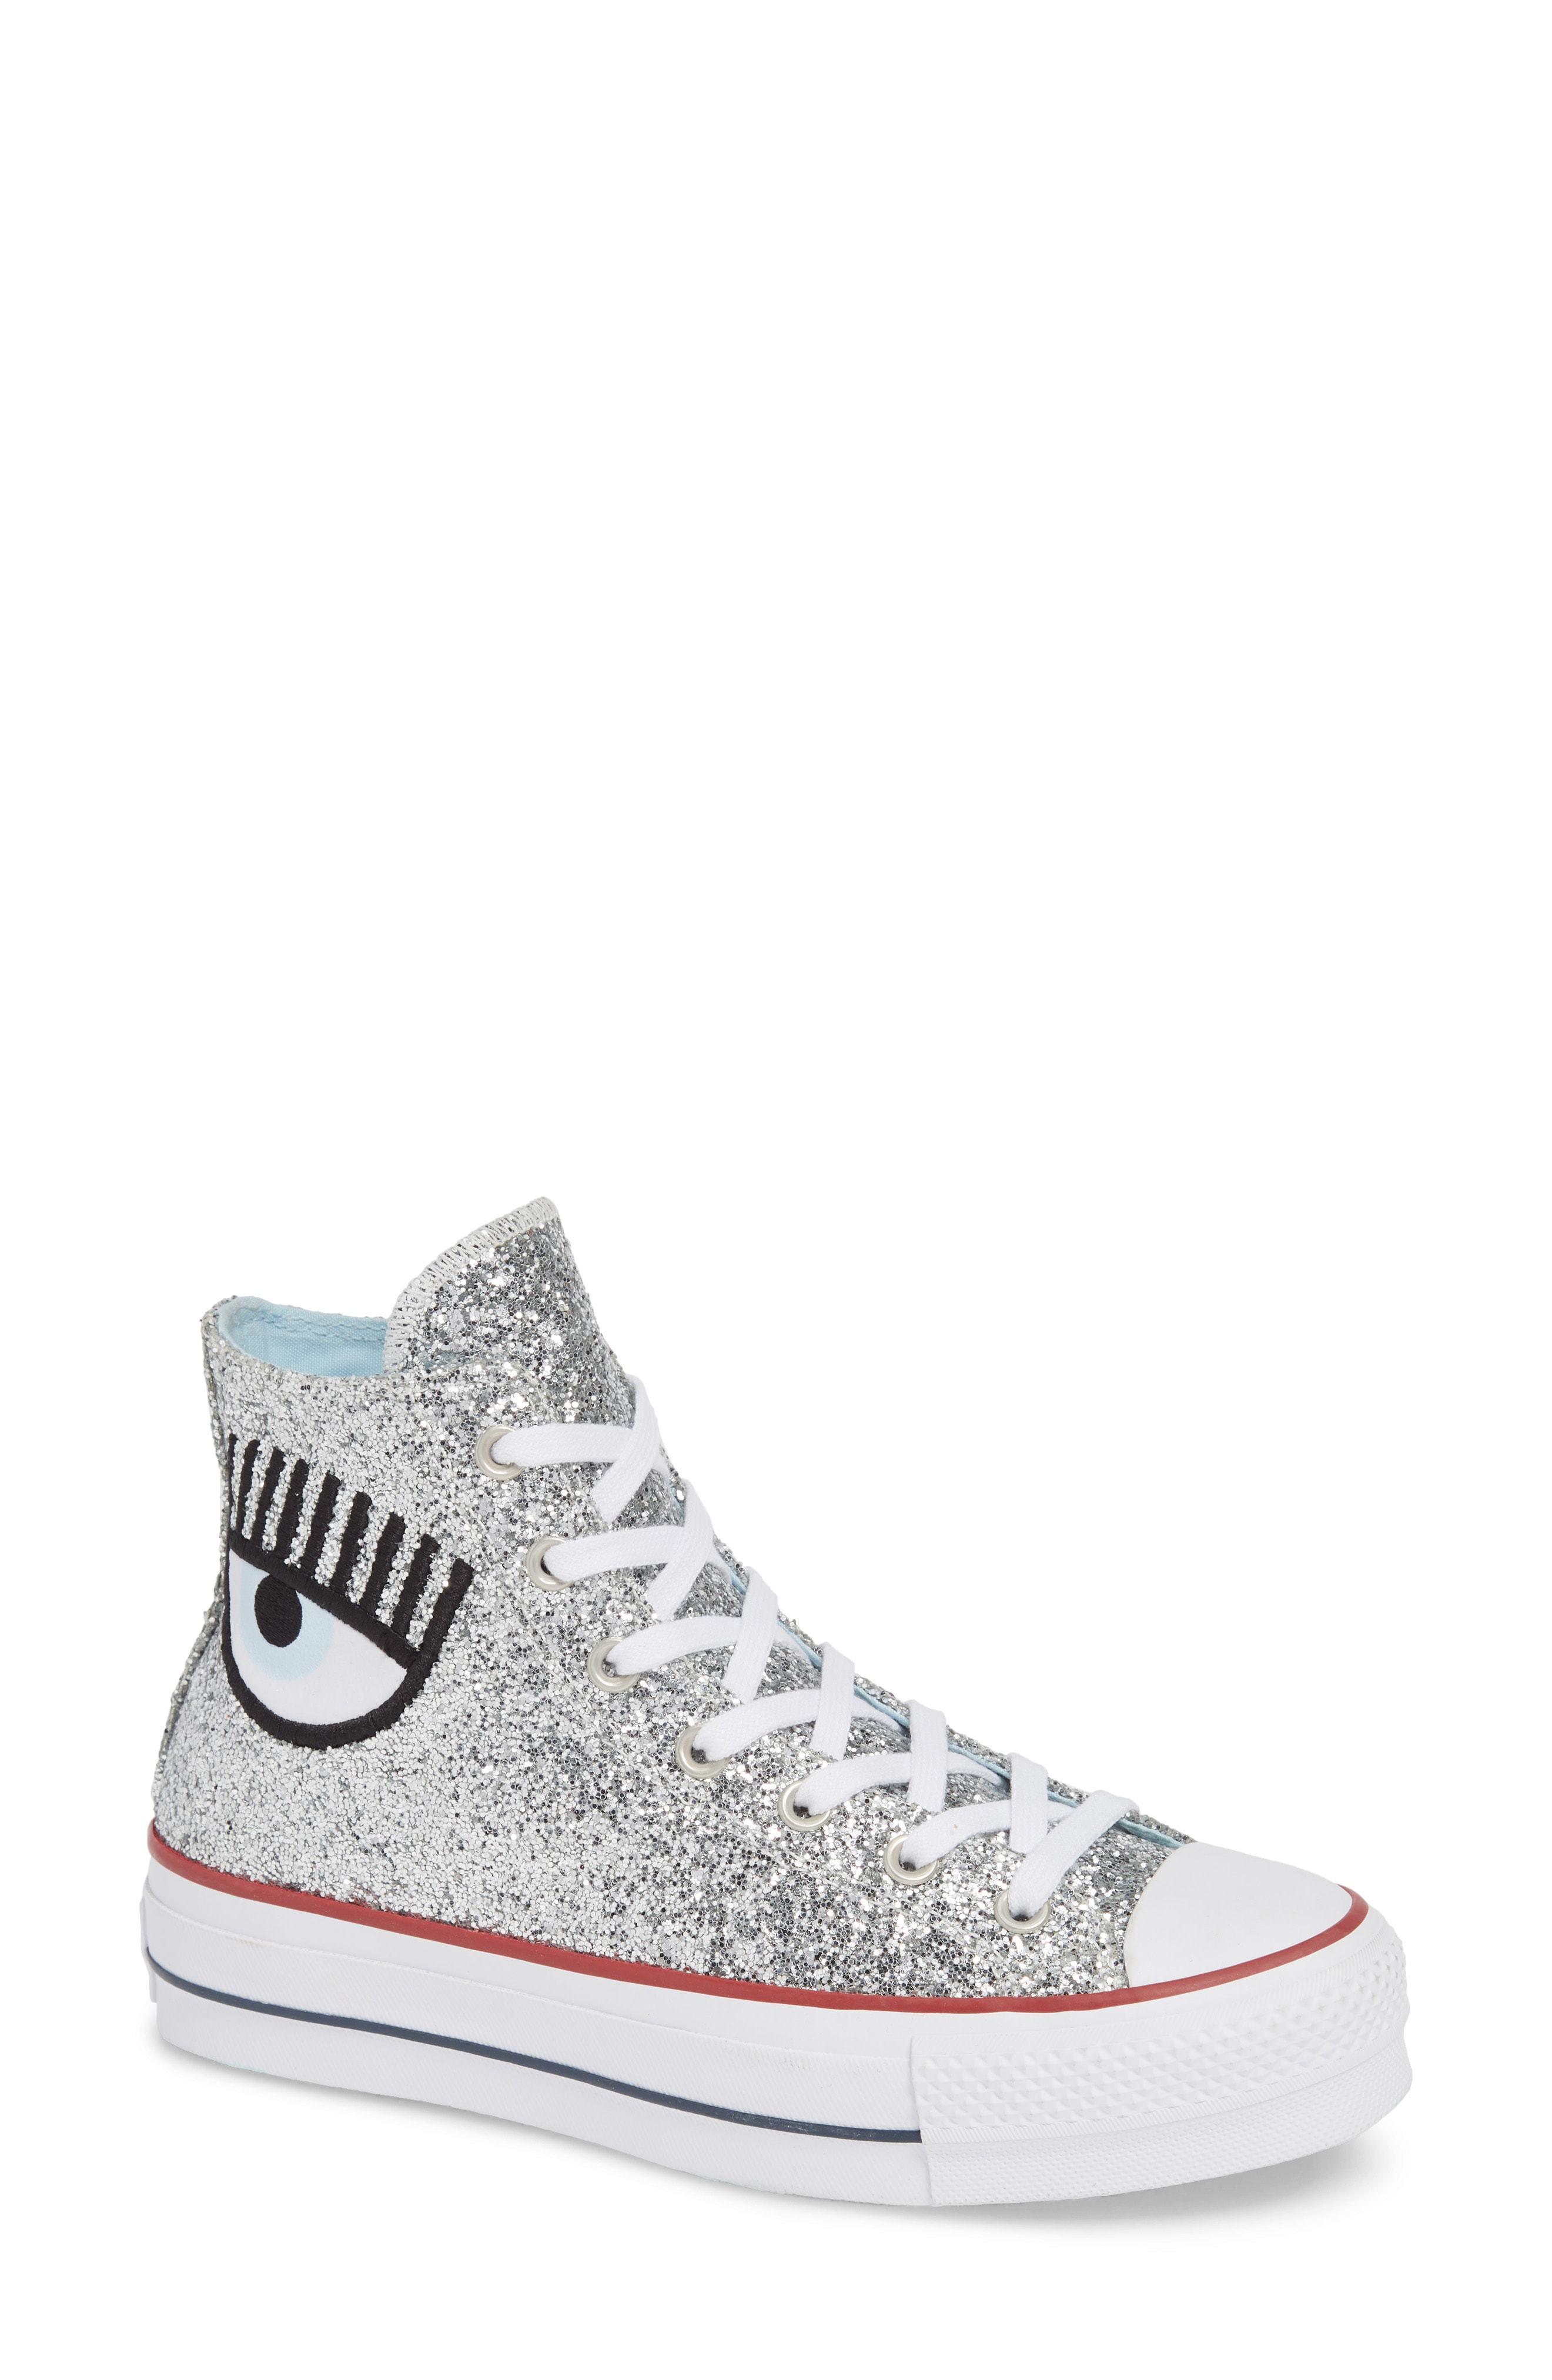 fdaa814e89cd ... Silver High Top Sneakers Converse X Chiara Ferragni 70 Hi One Star  Glitter Platform Sneaker